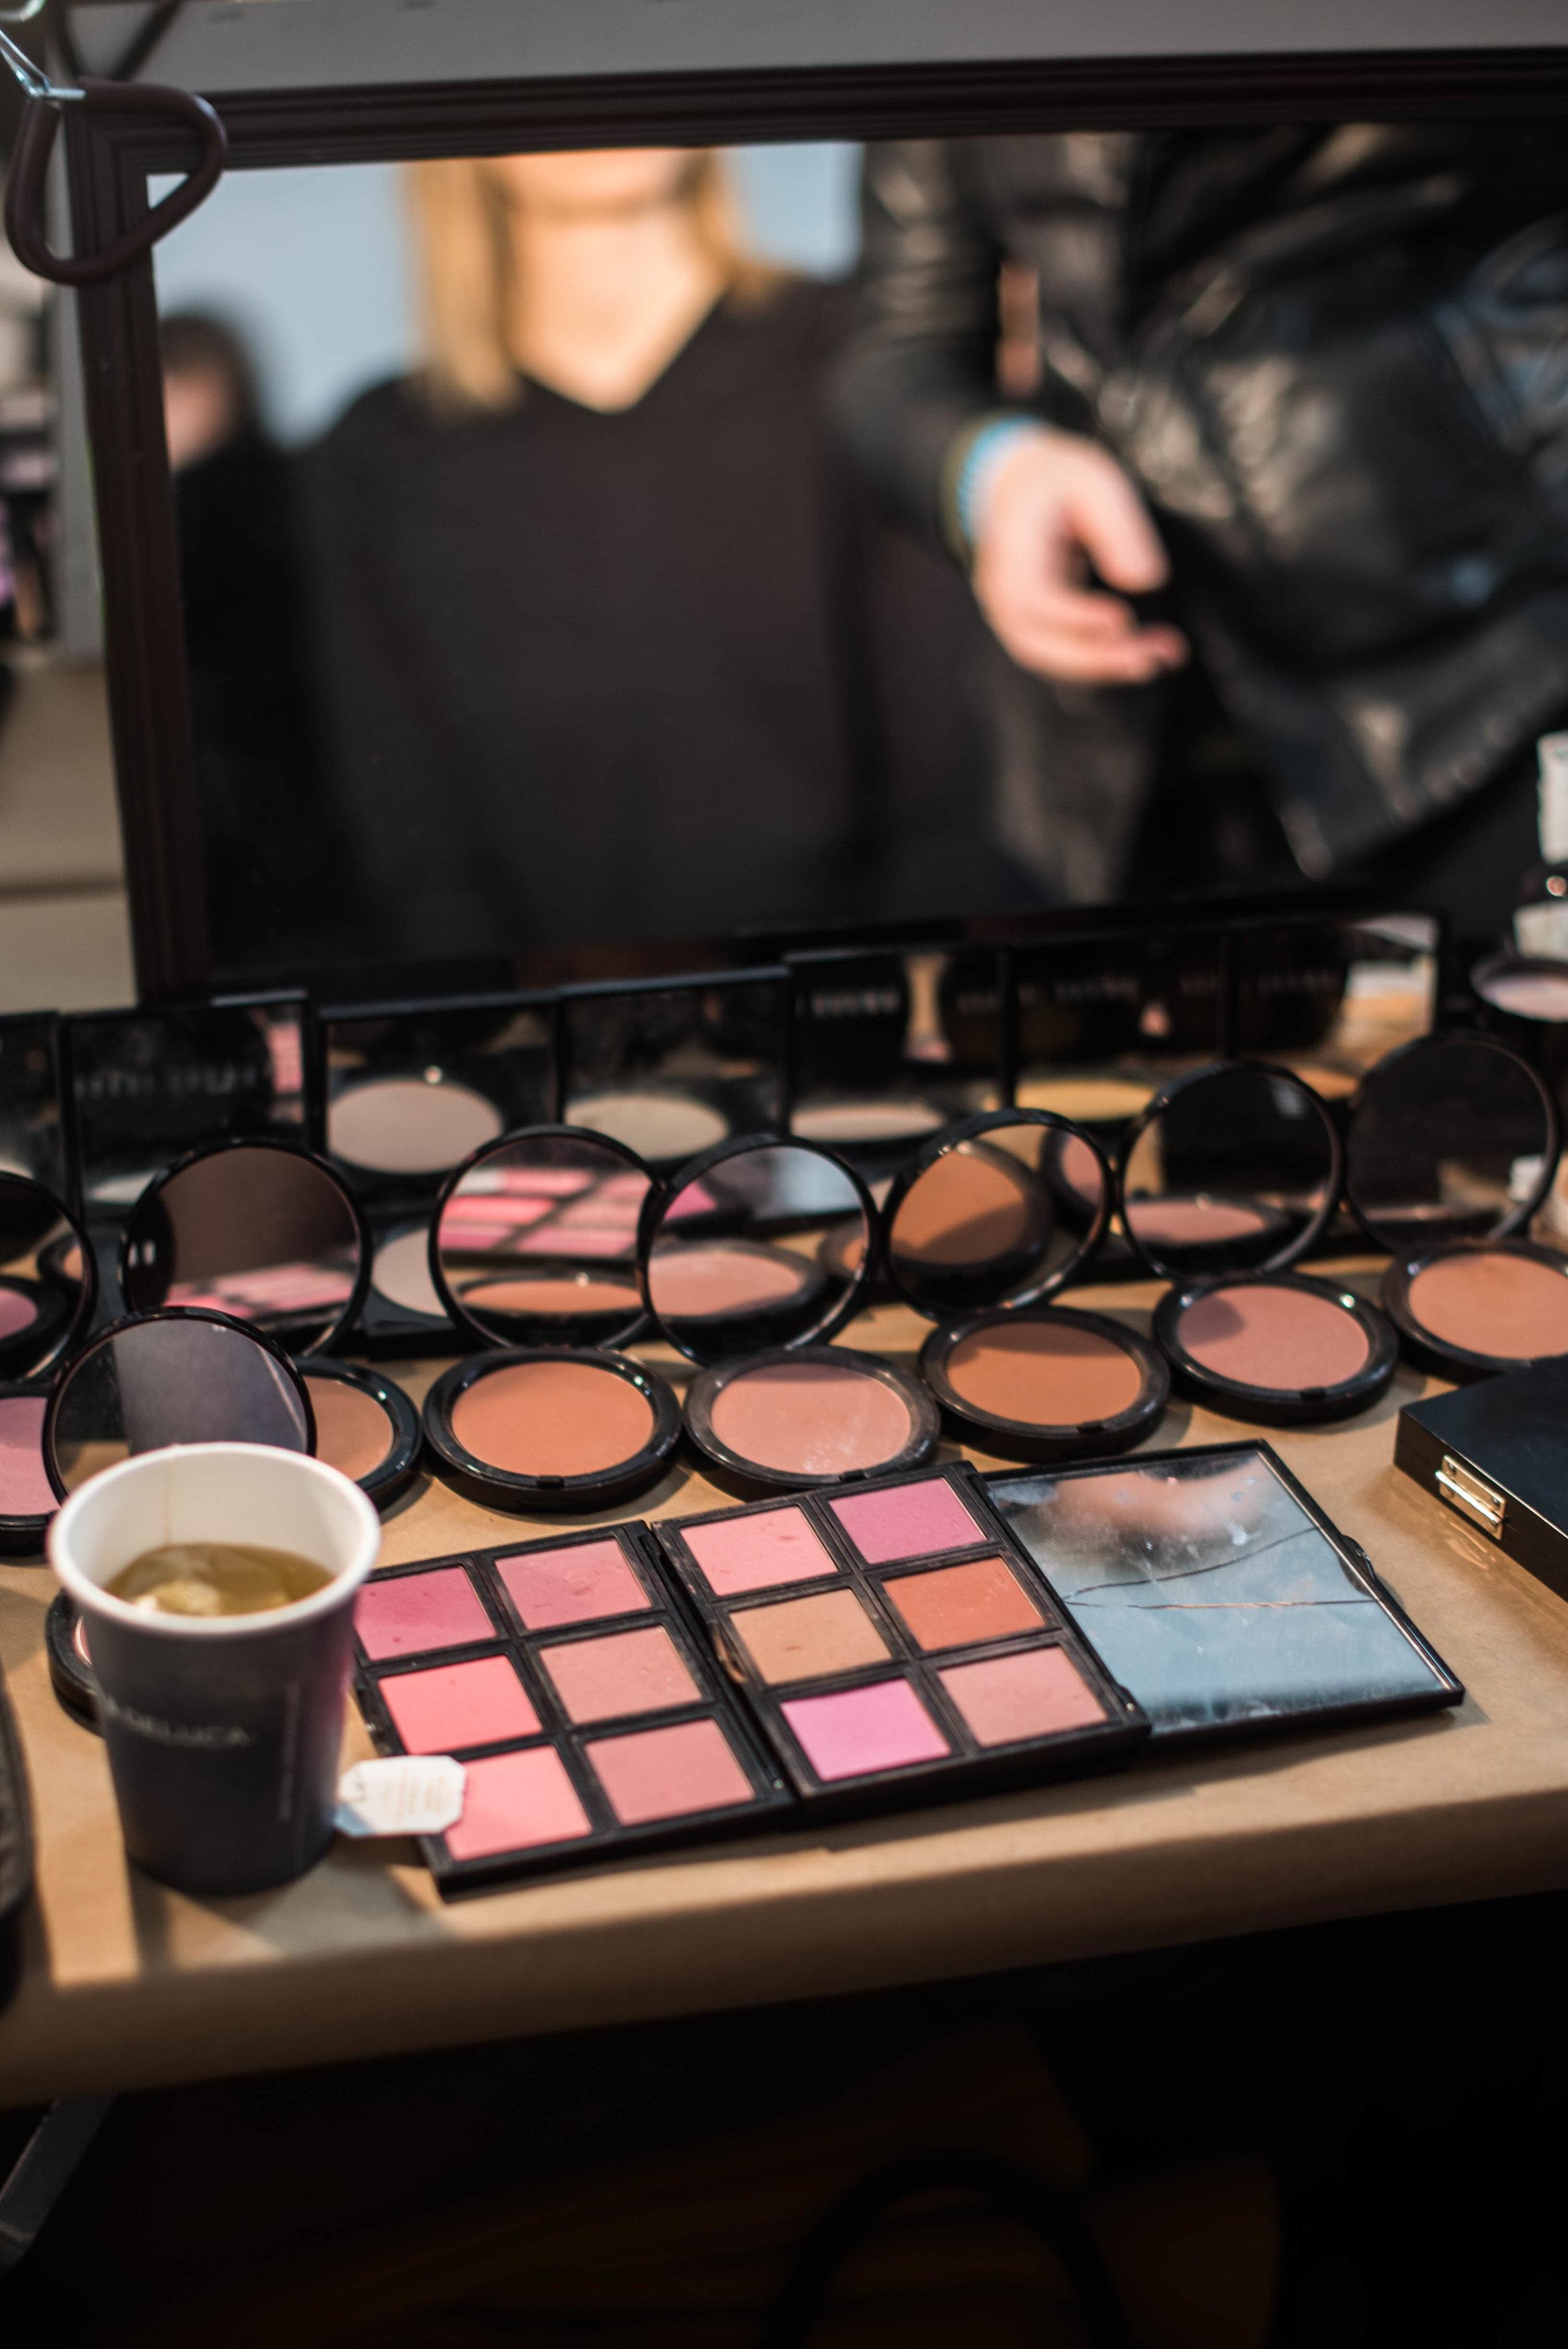 ROSE & IVY Journal Fall 2017 Tibi Backstage Beauty